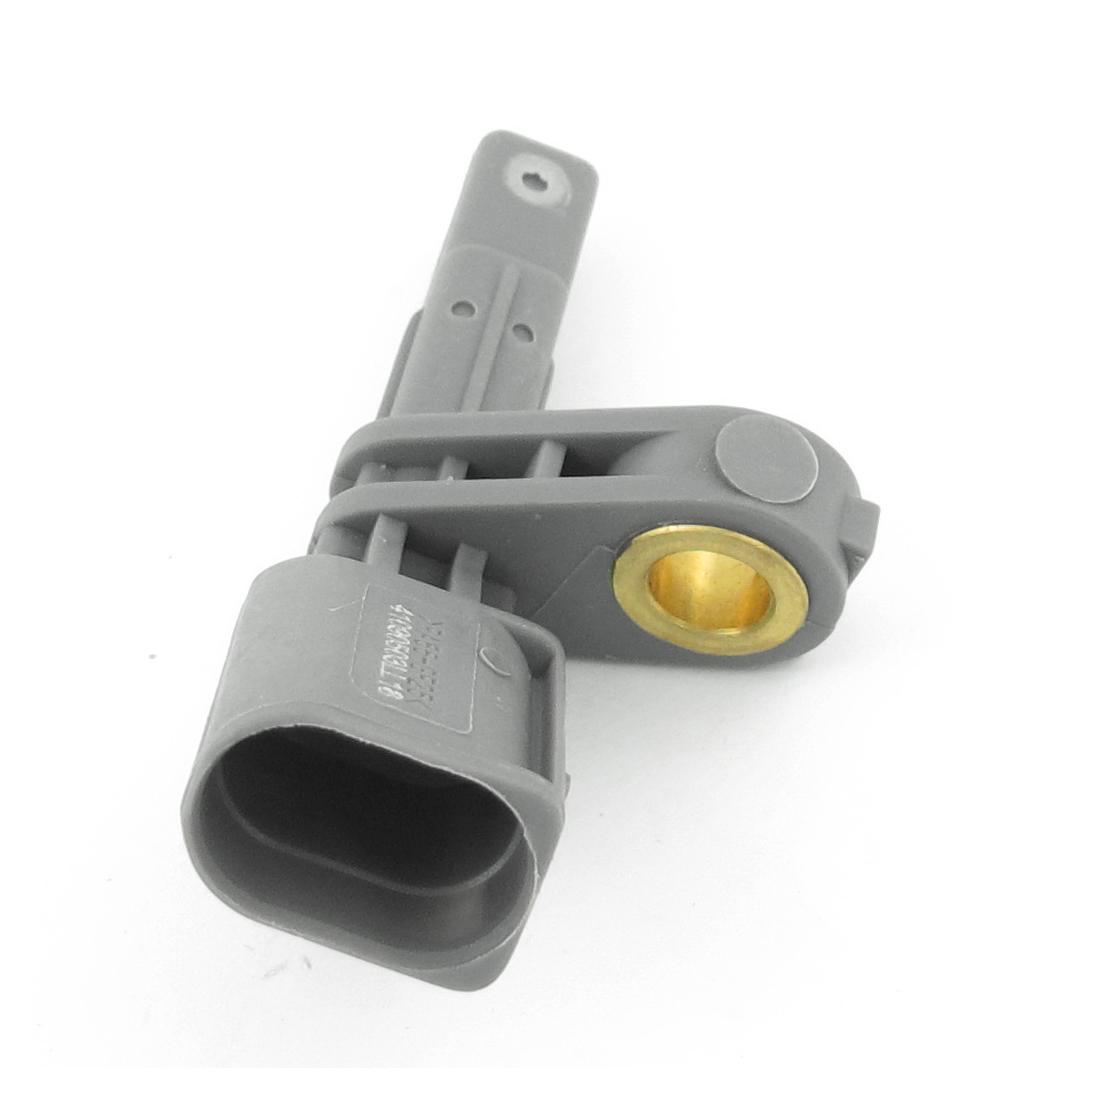 Vehicle Left Wheel Anti-lock Braking System ABS Sensor 7L0927808A for Audi